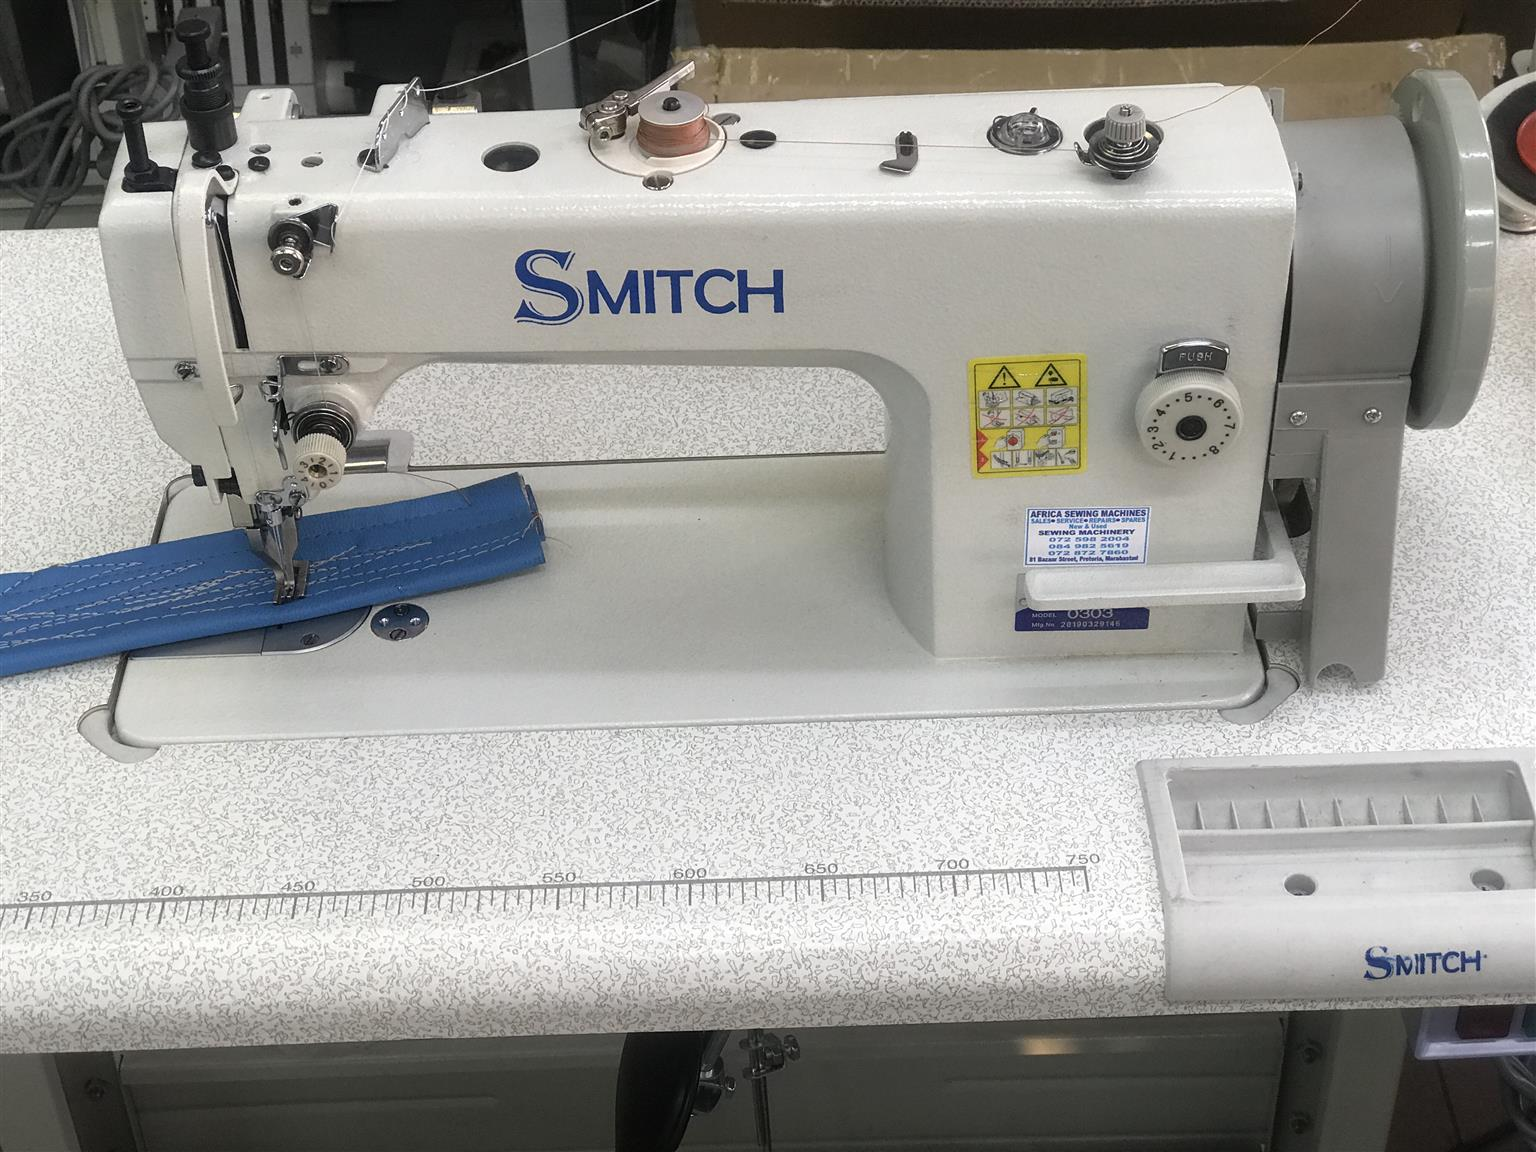 Brand new SMITCH WALKINGFOOT industrial sewing machines